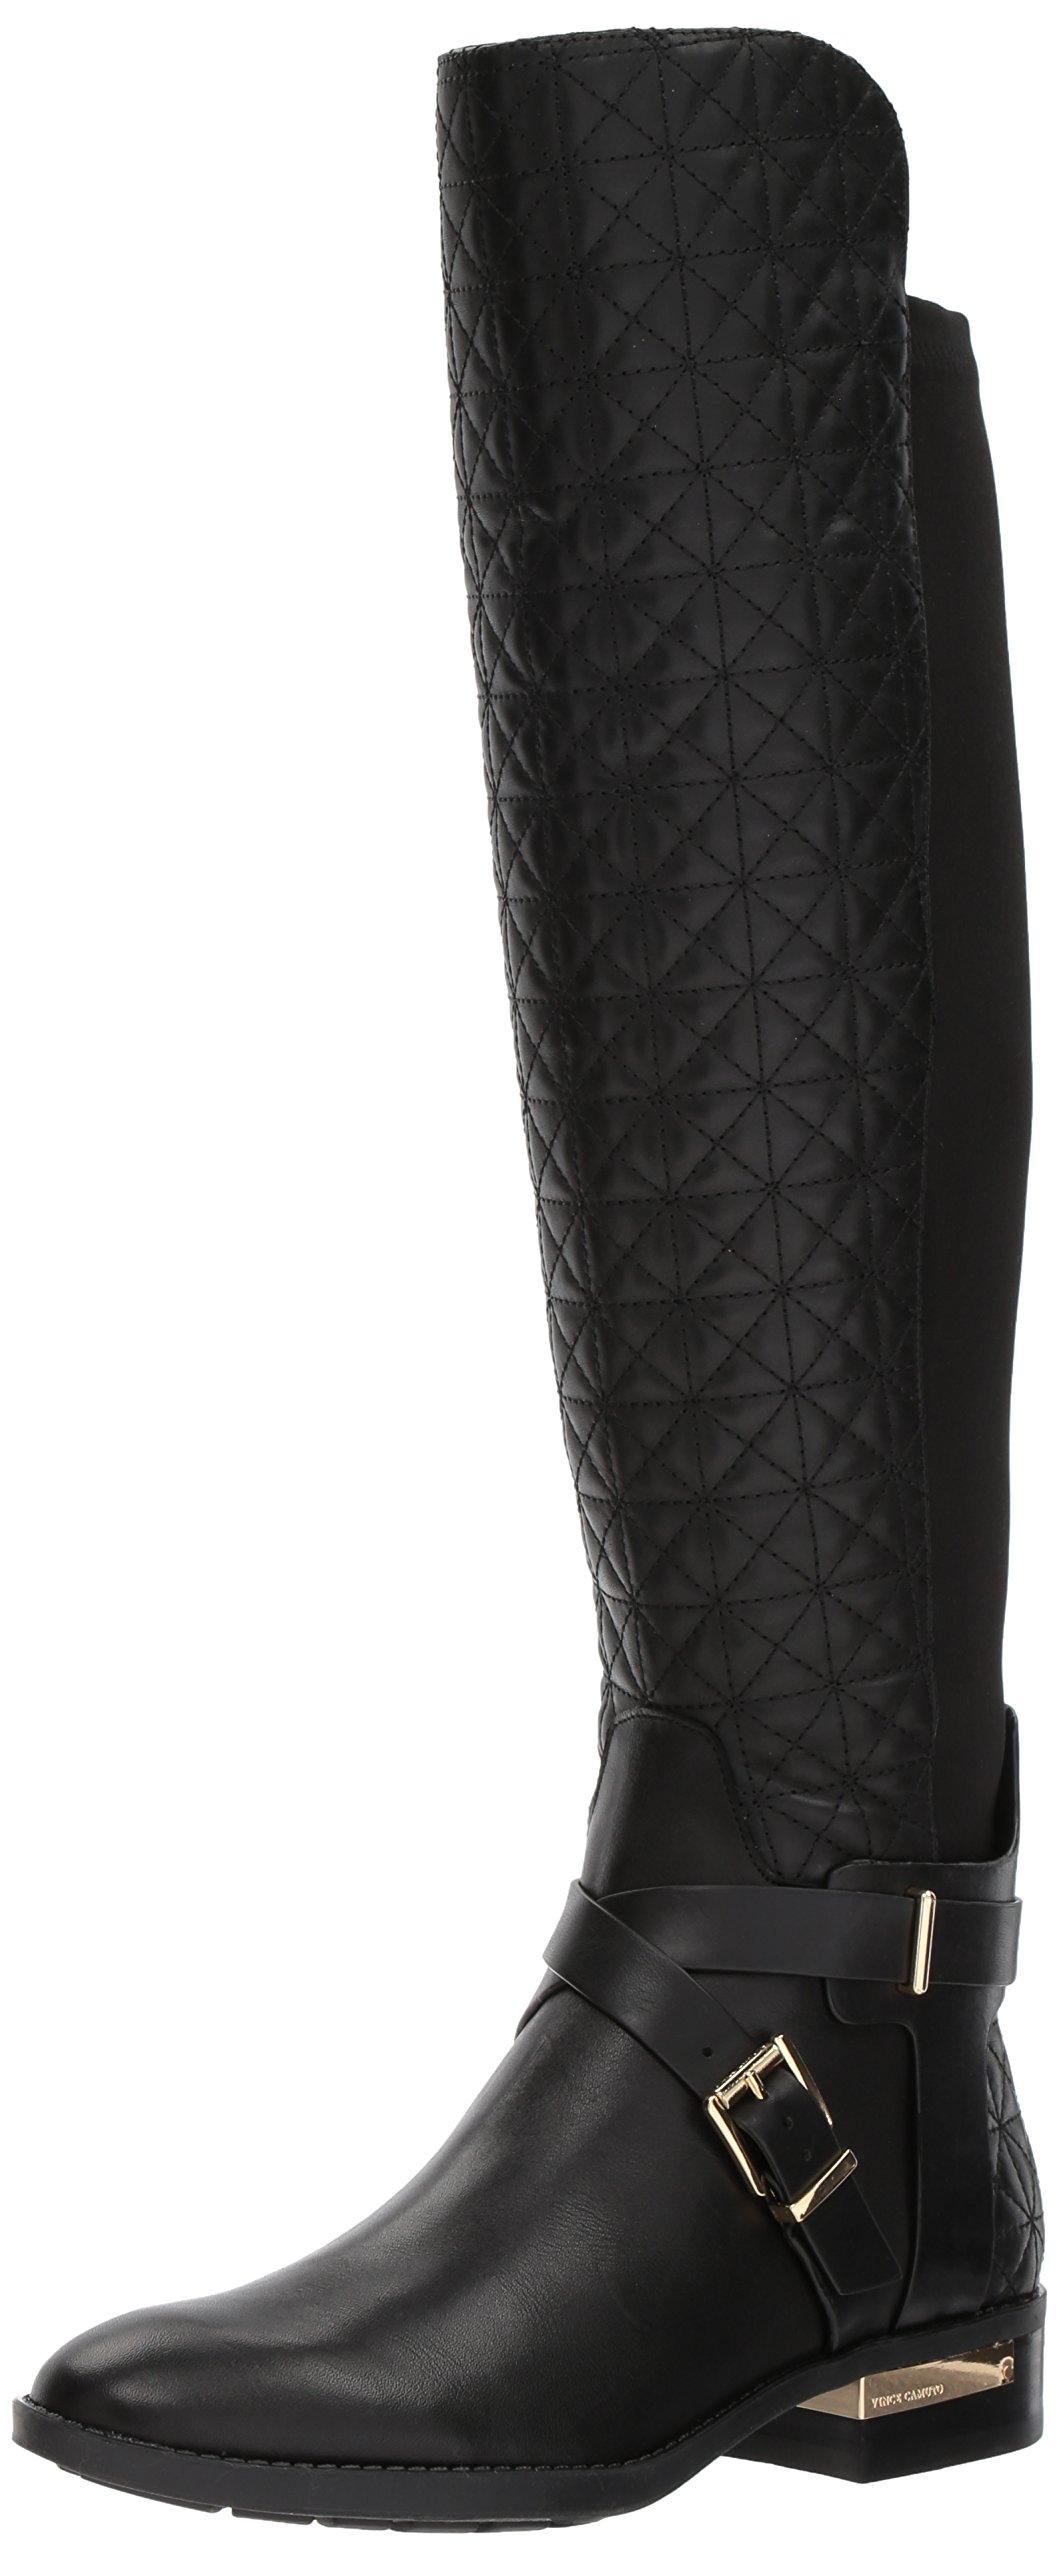 Vince Camuto Women's Patira Fashion Boot, Black, 9.5 Medium US